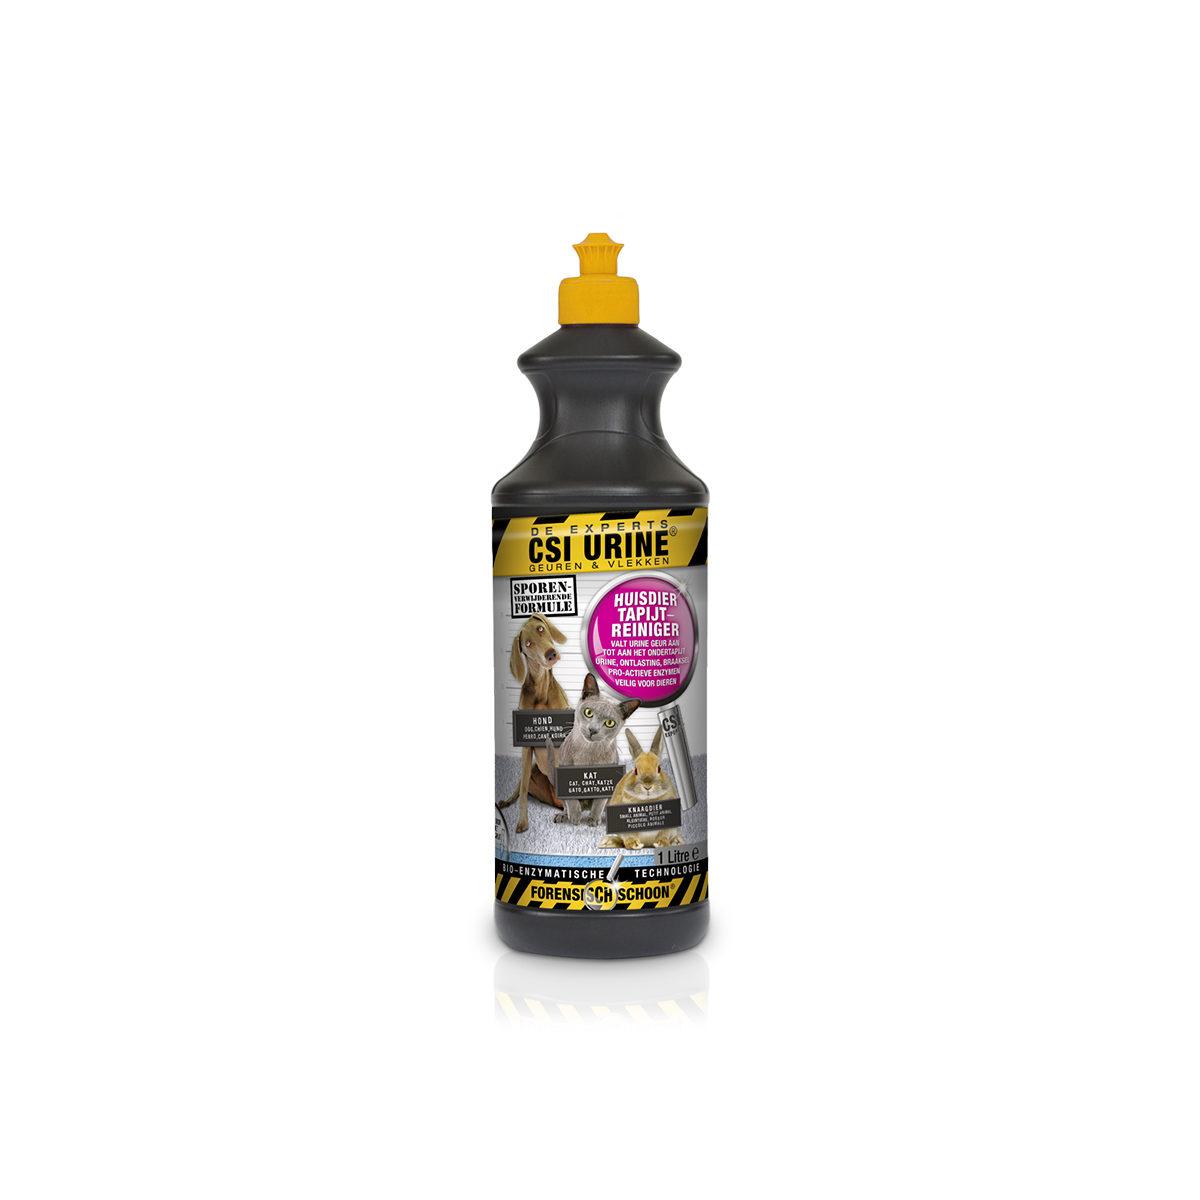 CSI Urine Tapijt Penetrator 1 l - in Kattenbakken & kattenbakaccessoires